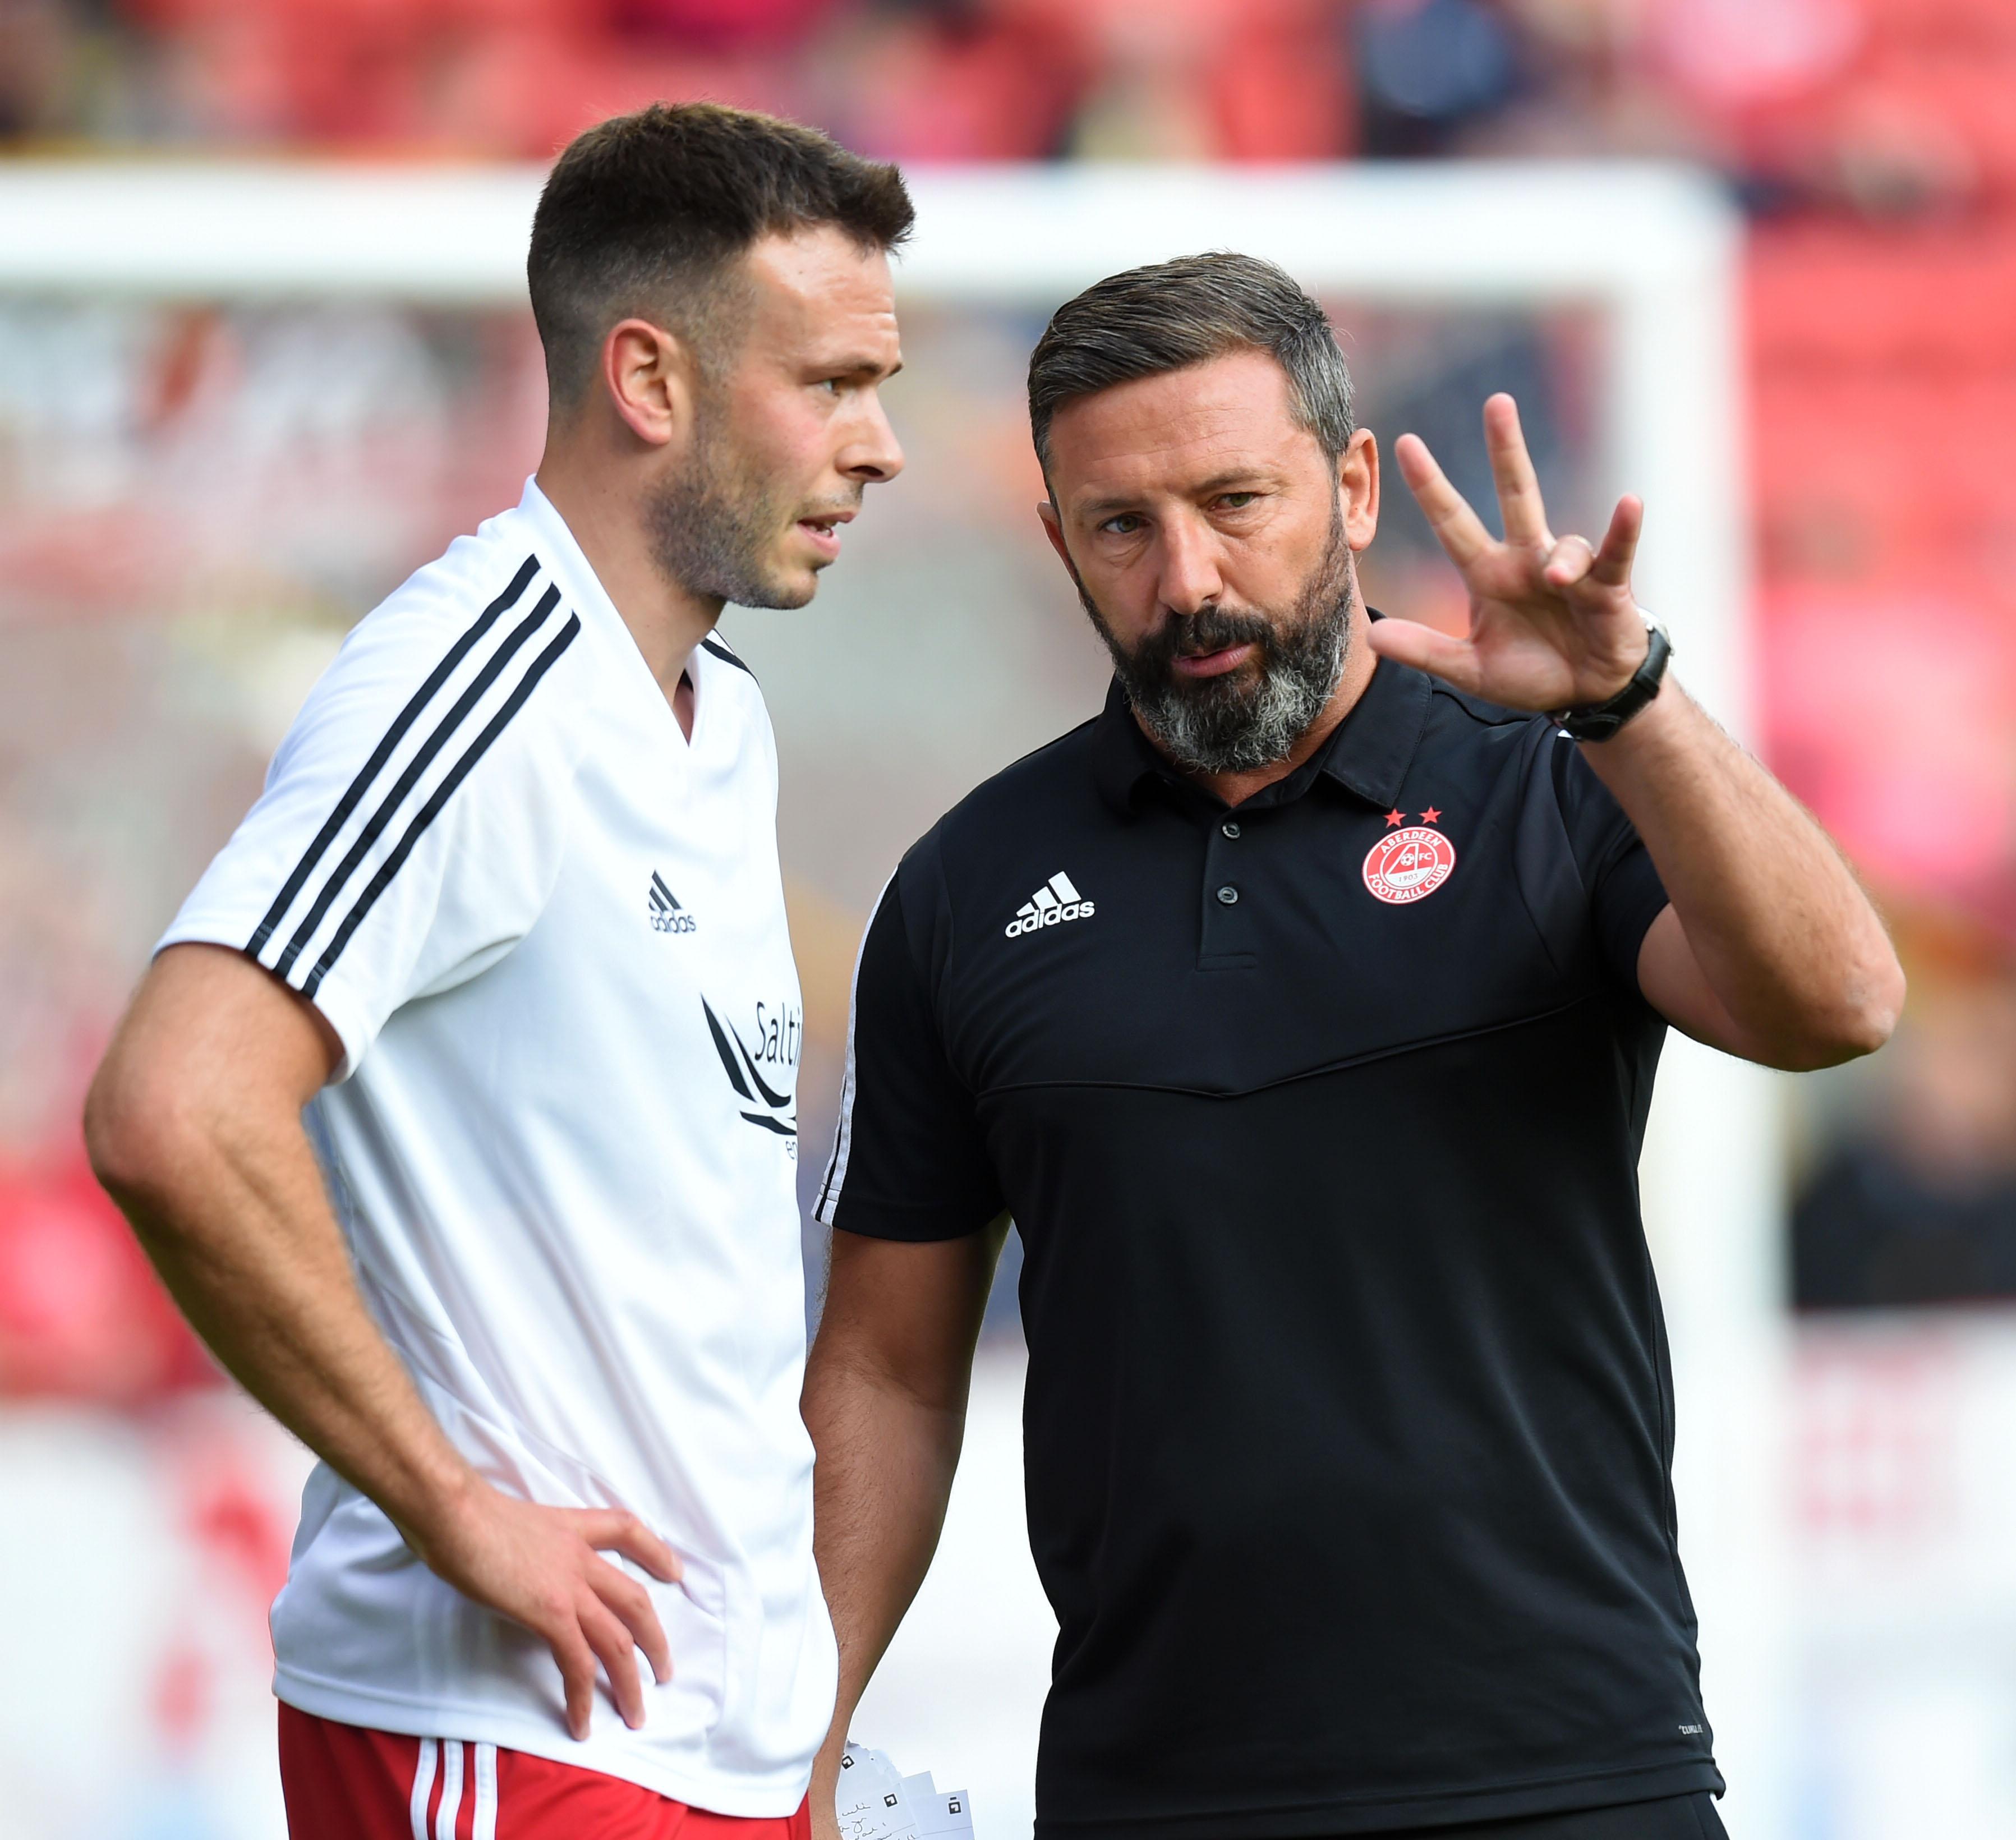 Aberdeen manager Derek McInnes issues instructions to Andrew Considine